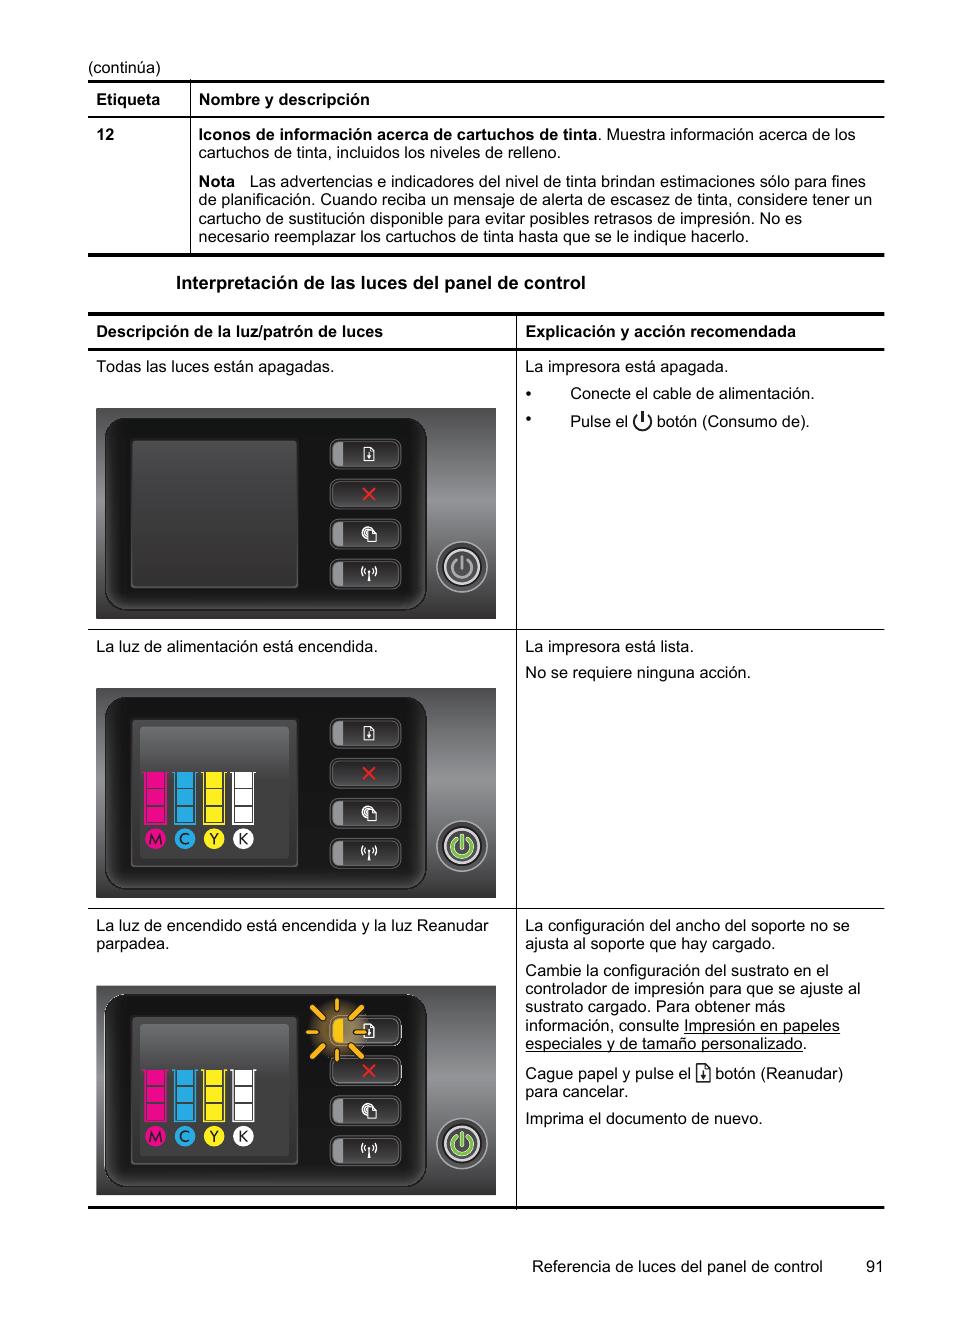 HP Impresora HP Officejet Pro 8100 ePrinter - N811a N811d Manual del  usuario   Página 95